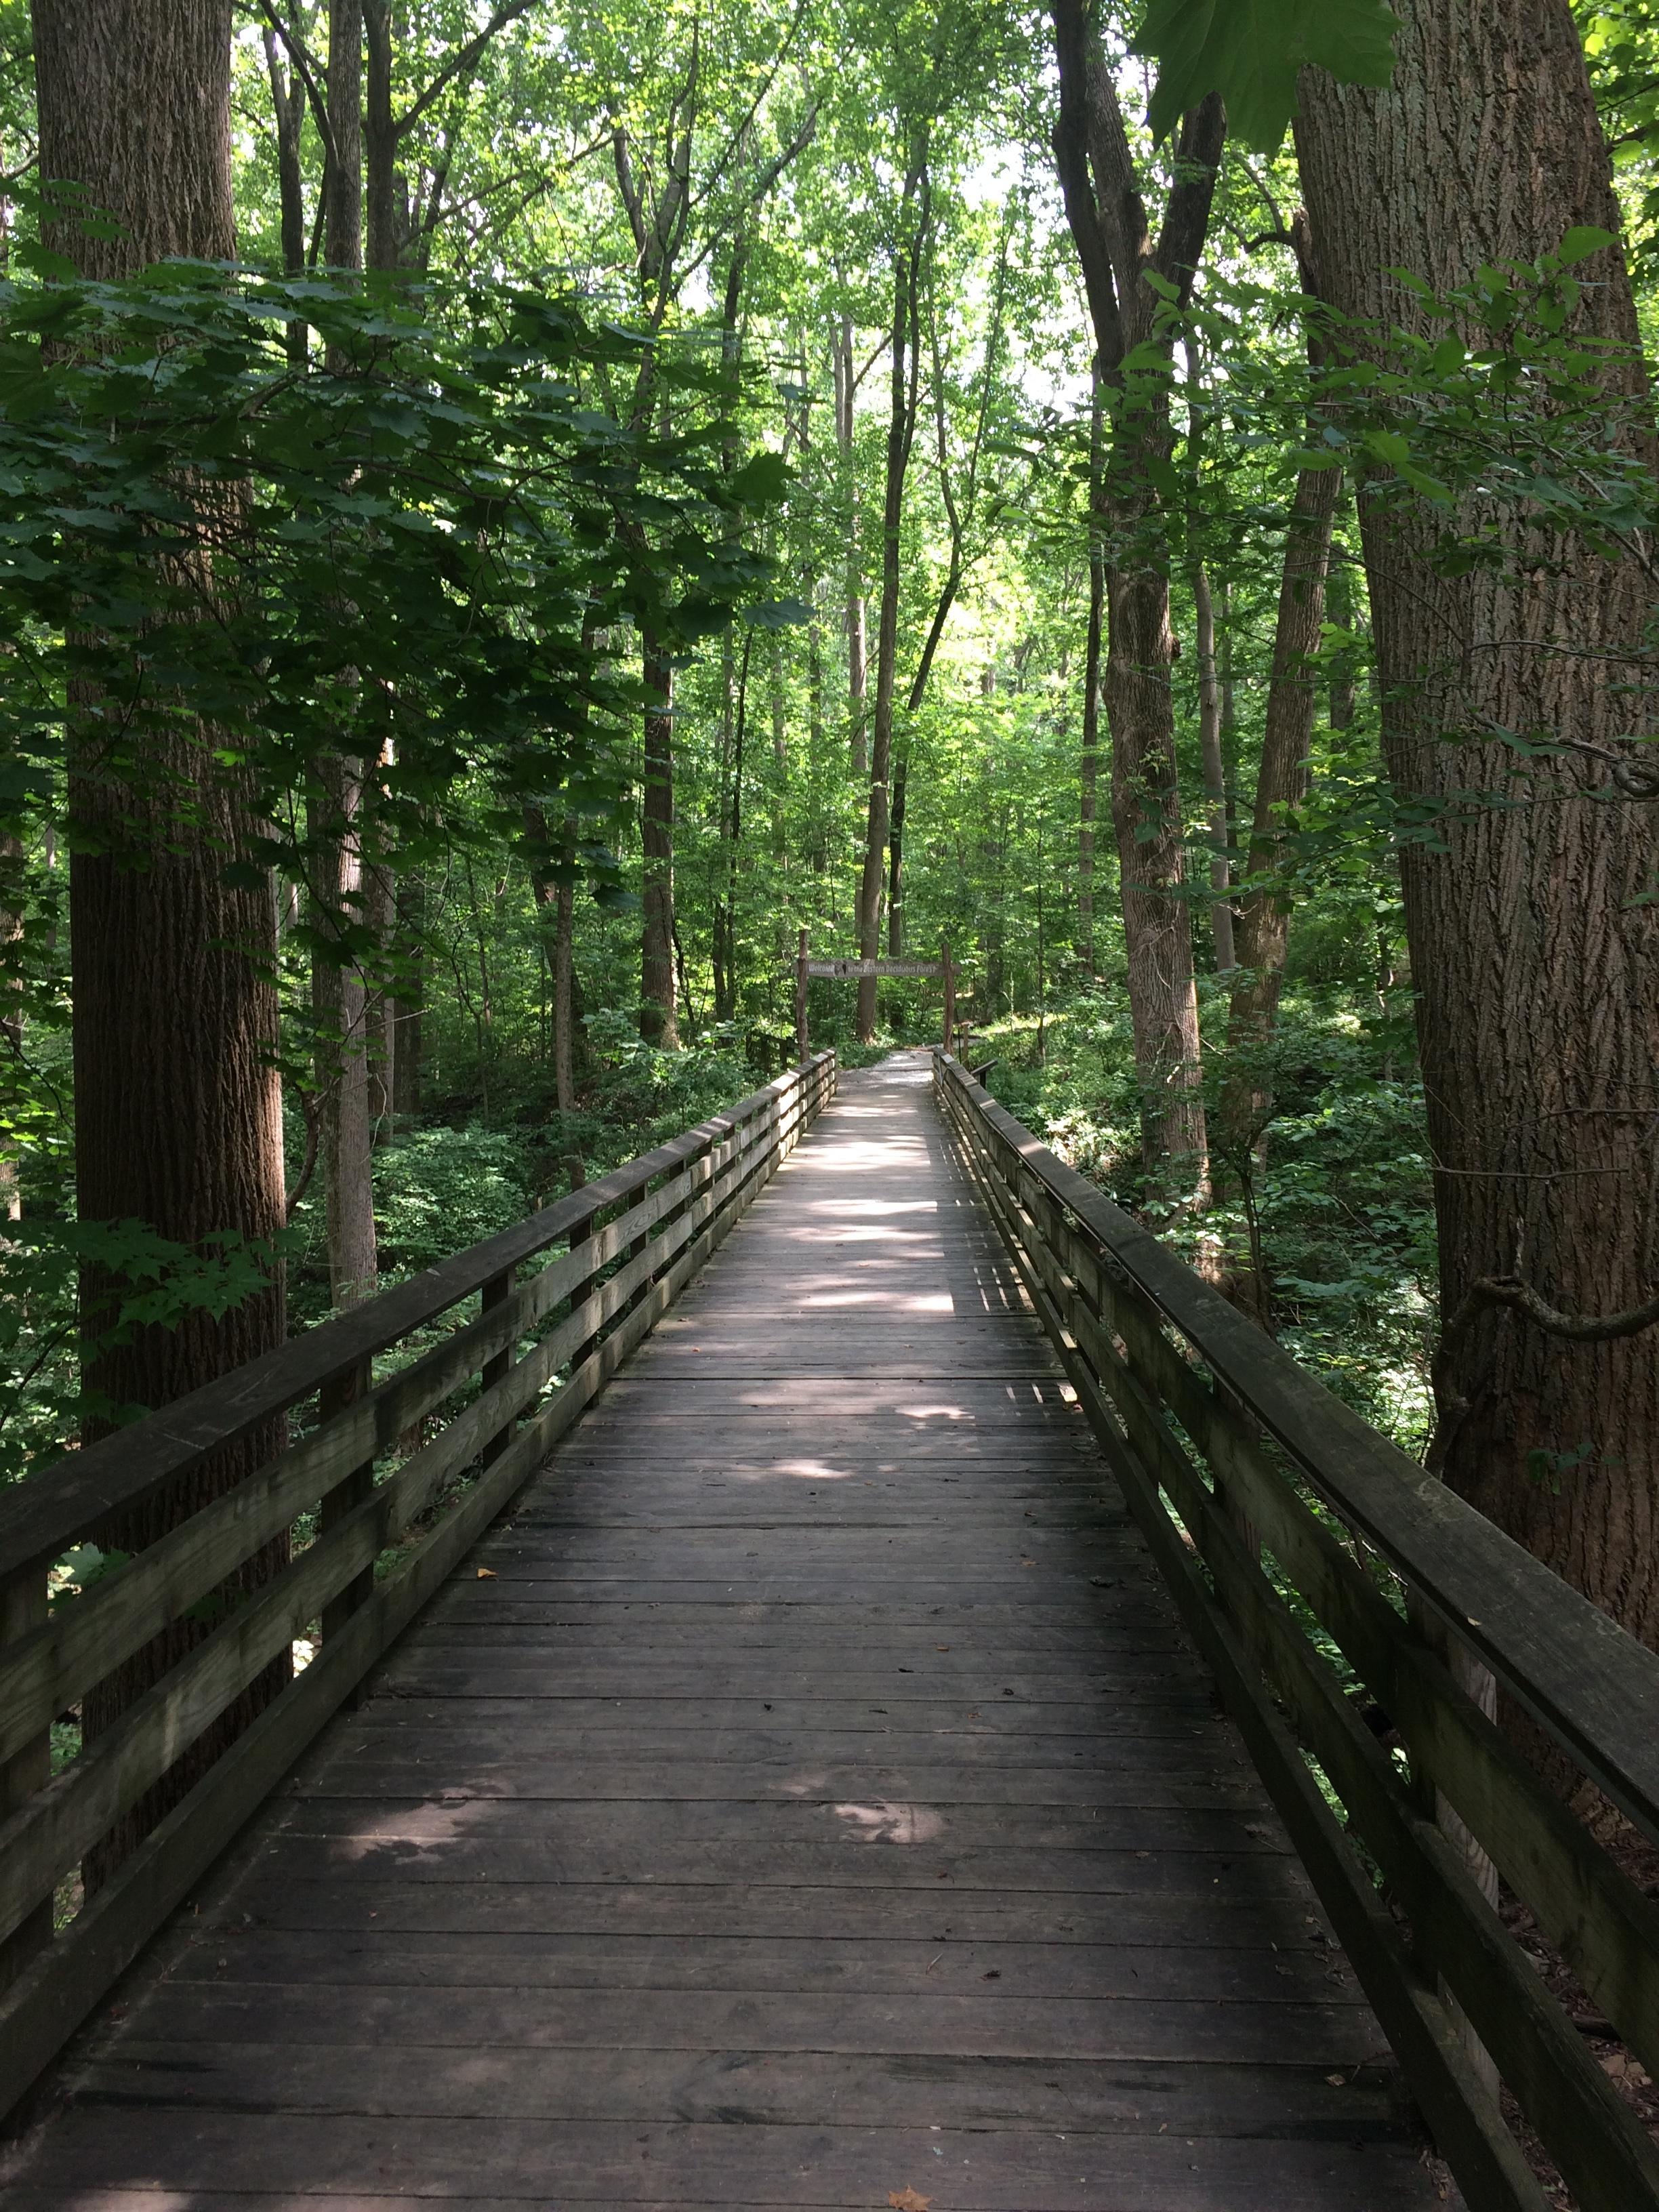 The path we create